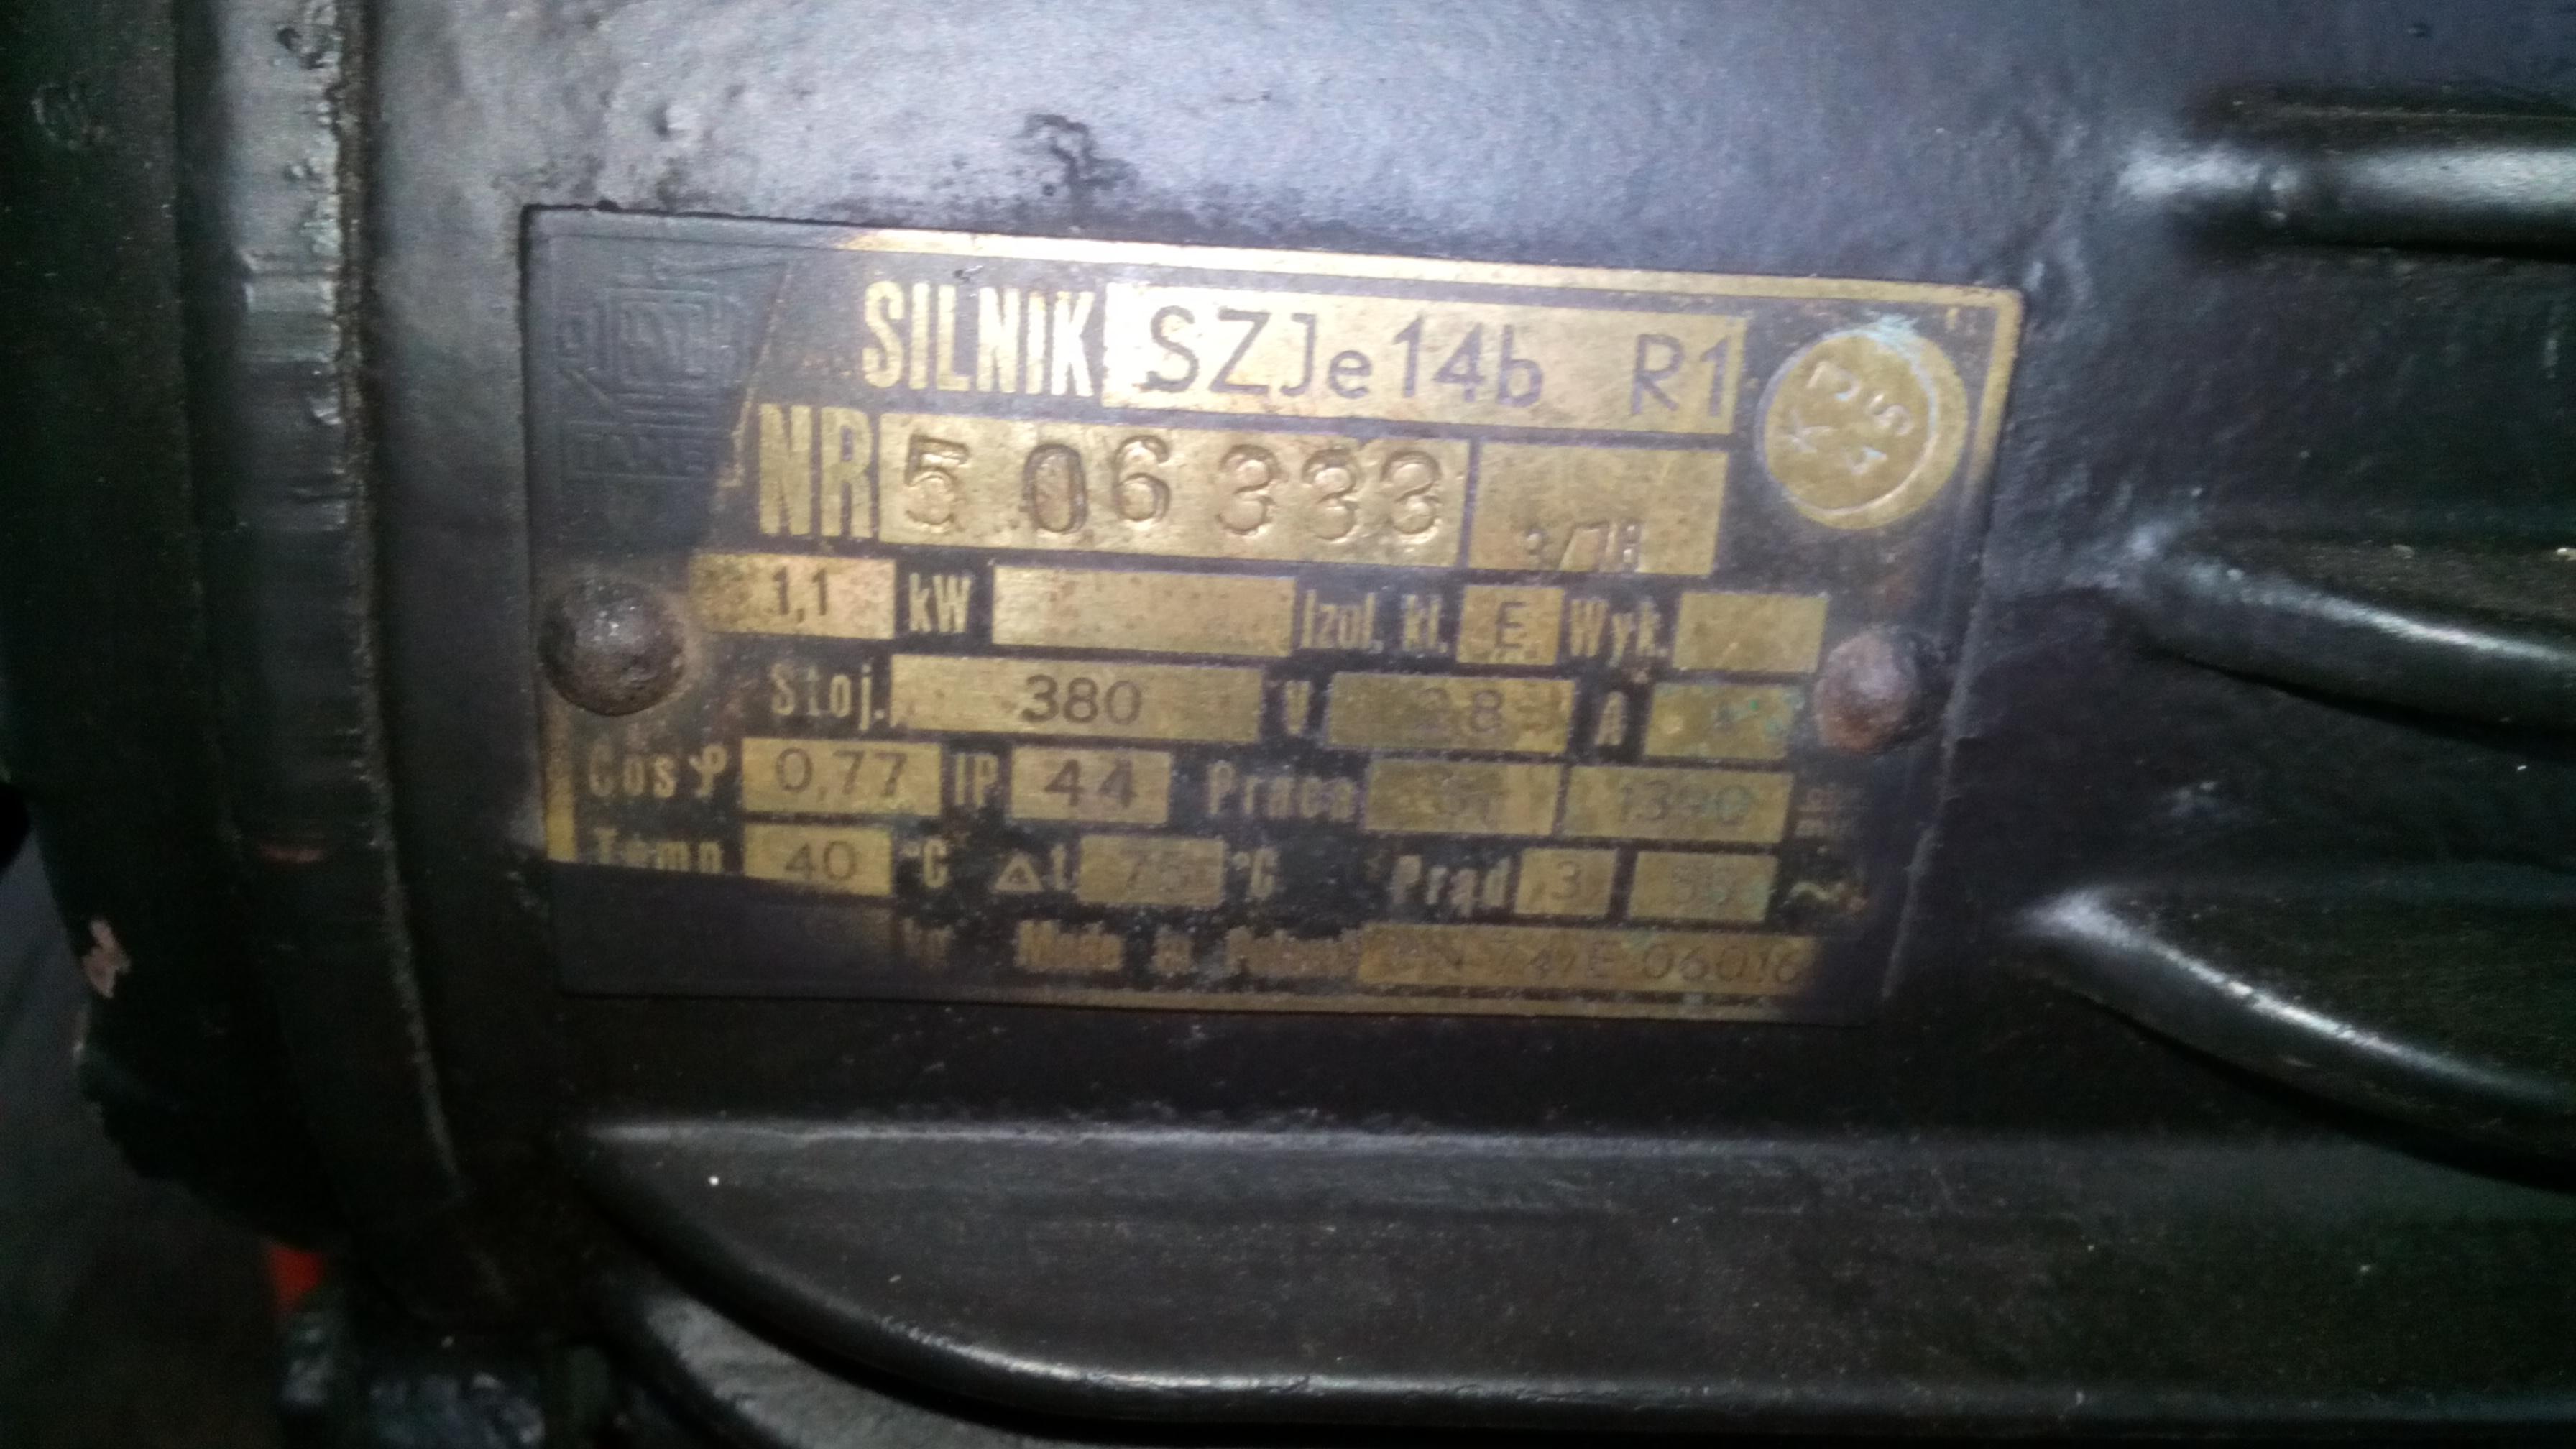 Kompresor samor�bka - ma�a autopsja :P